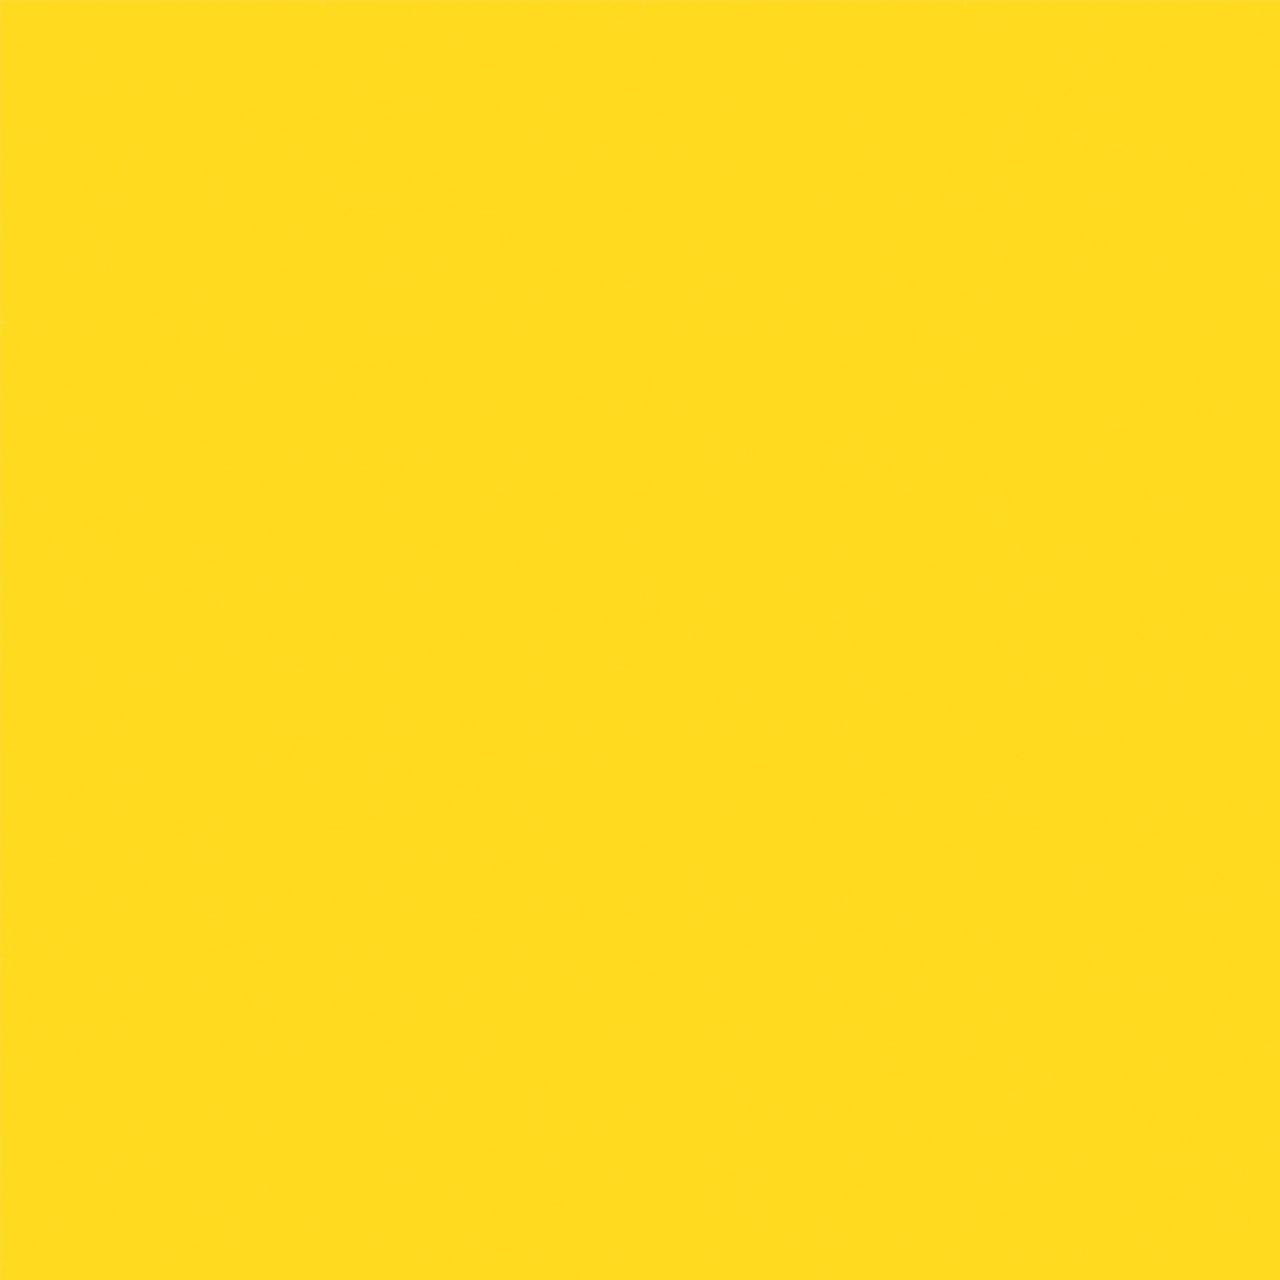 K04.0.5 Zinc Yellow